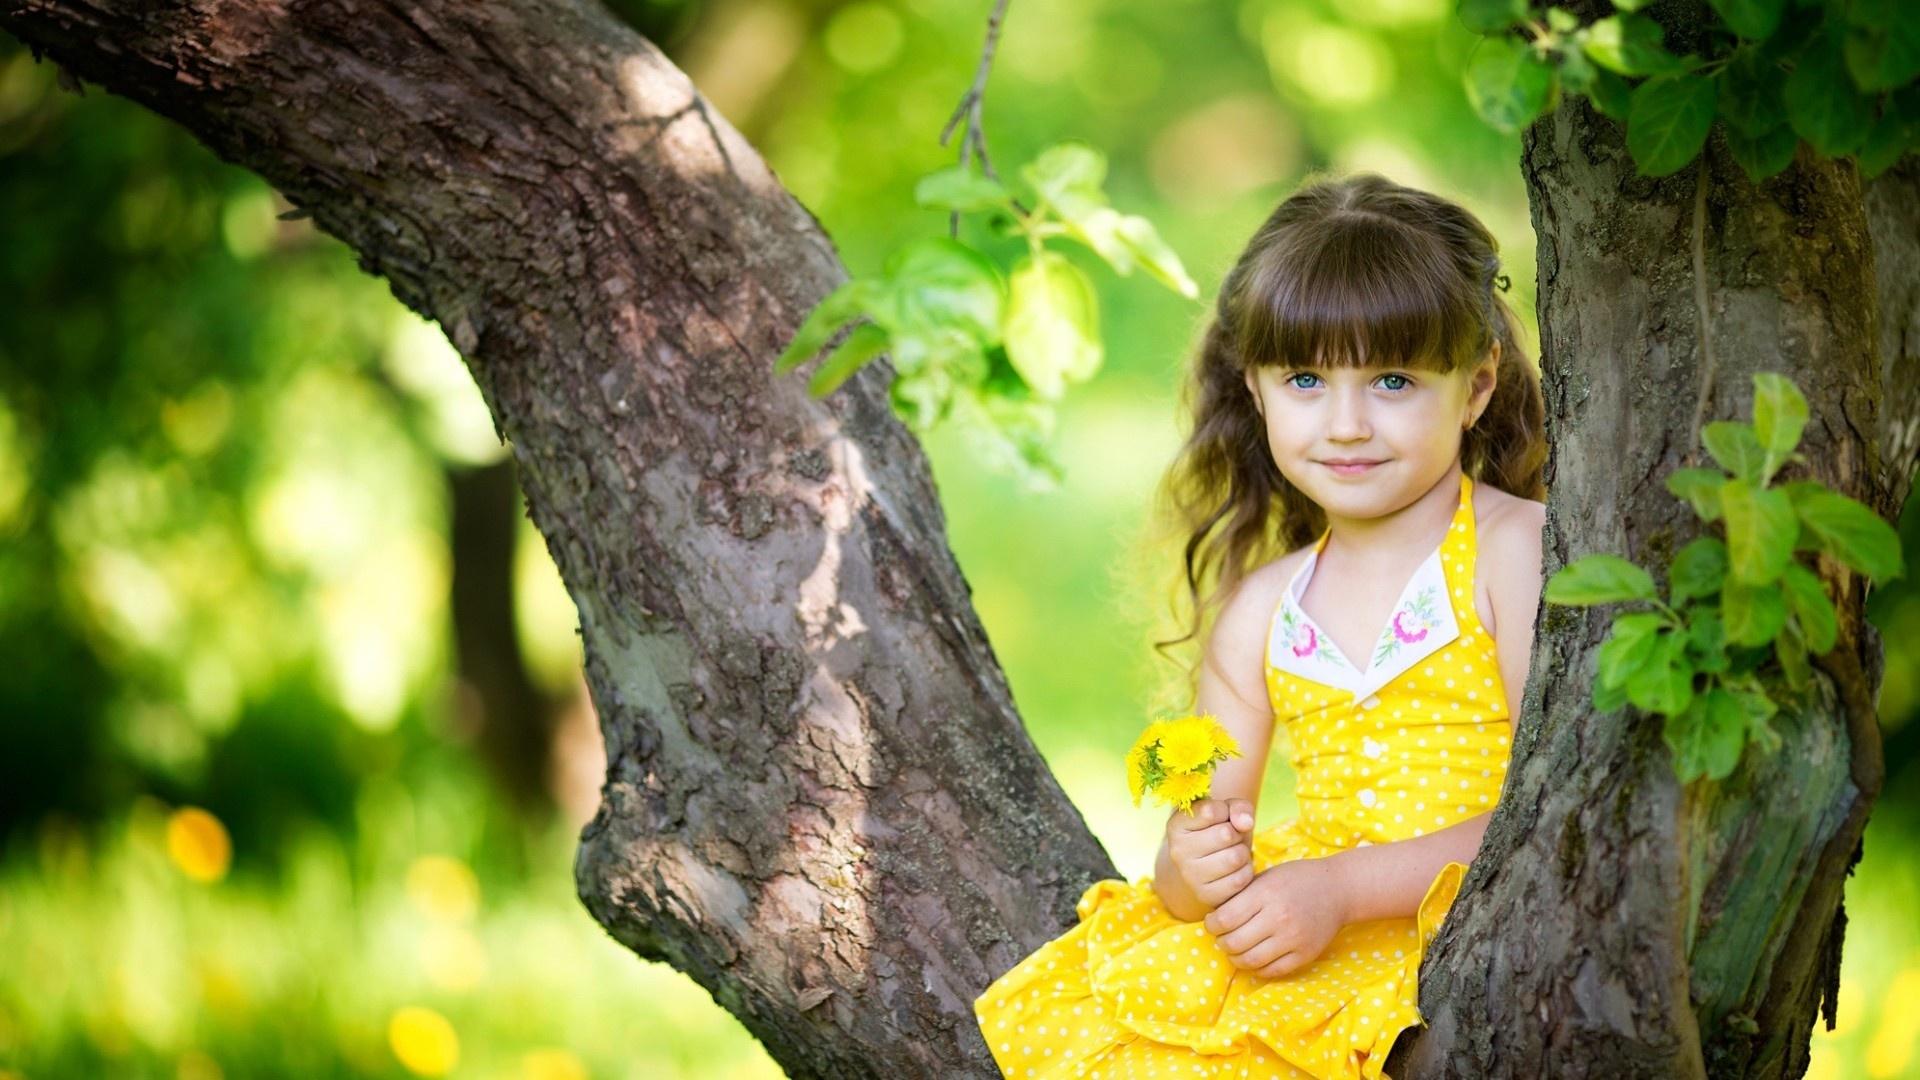 Cute Baby Girl HD Wallpapers 2015 1920x1080